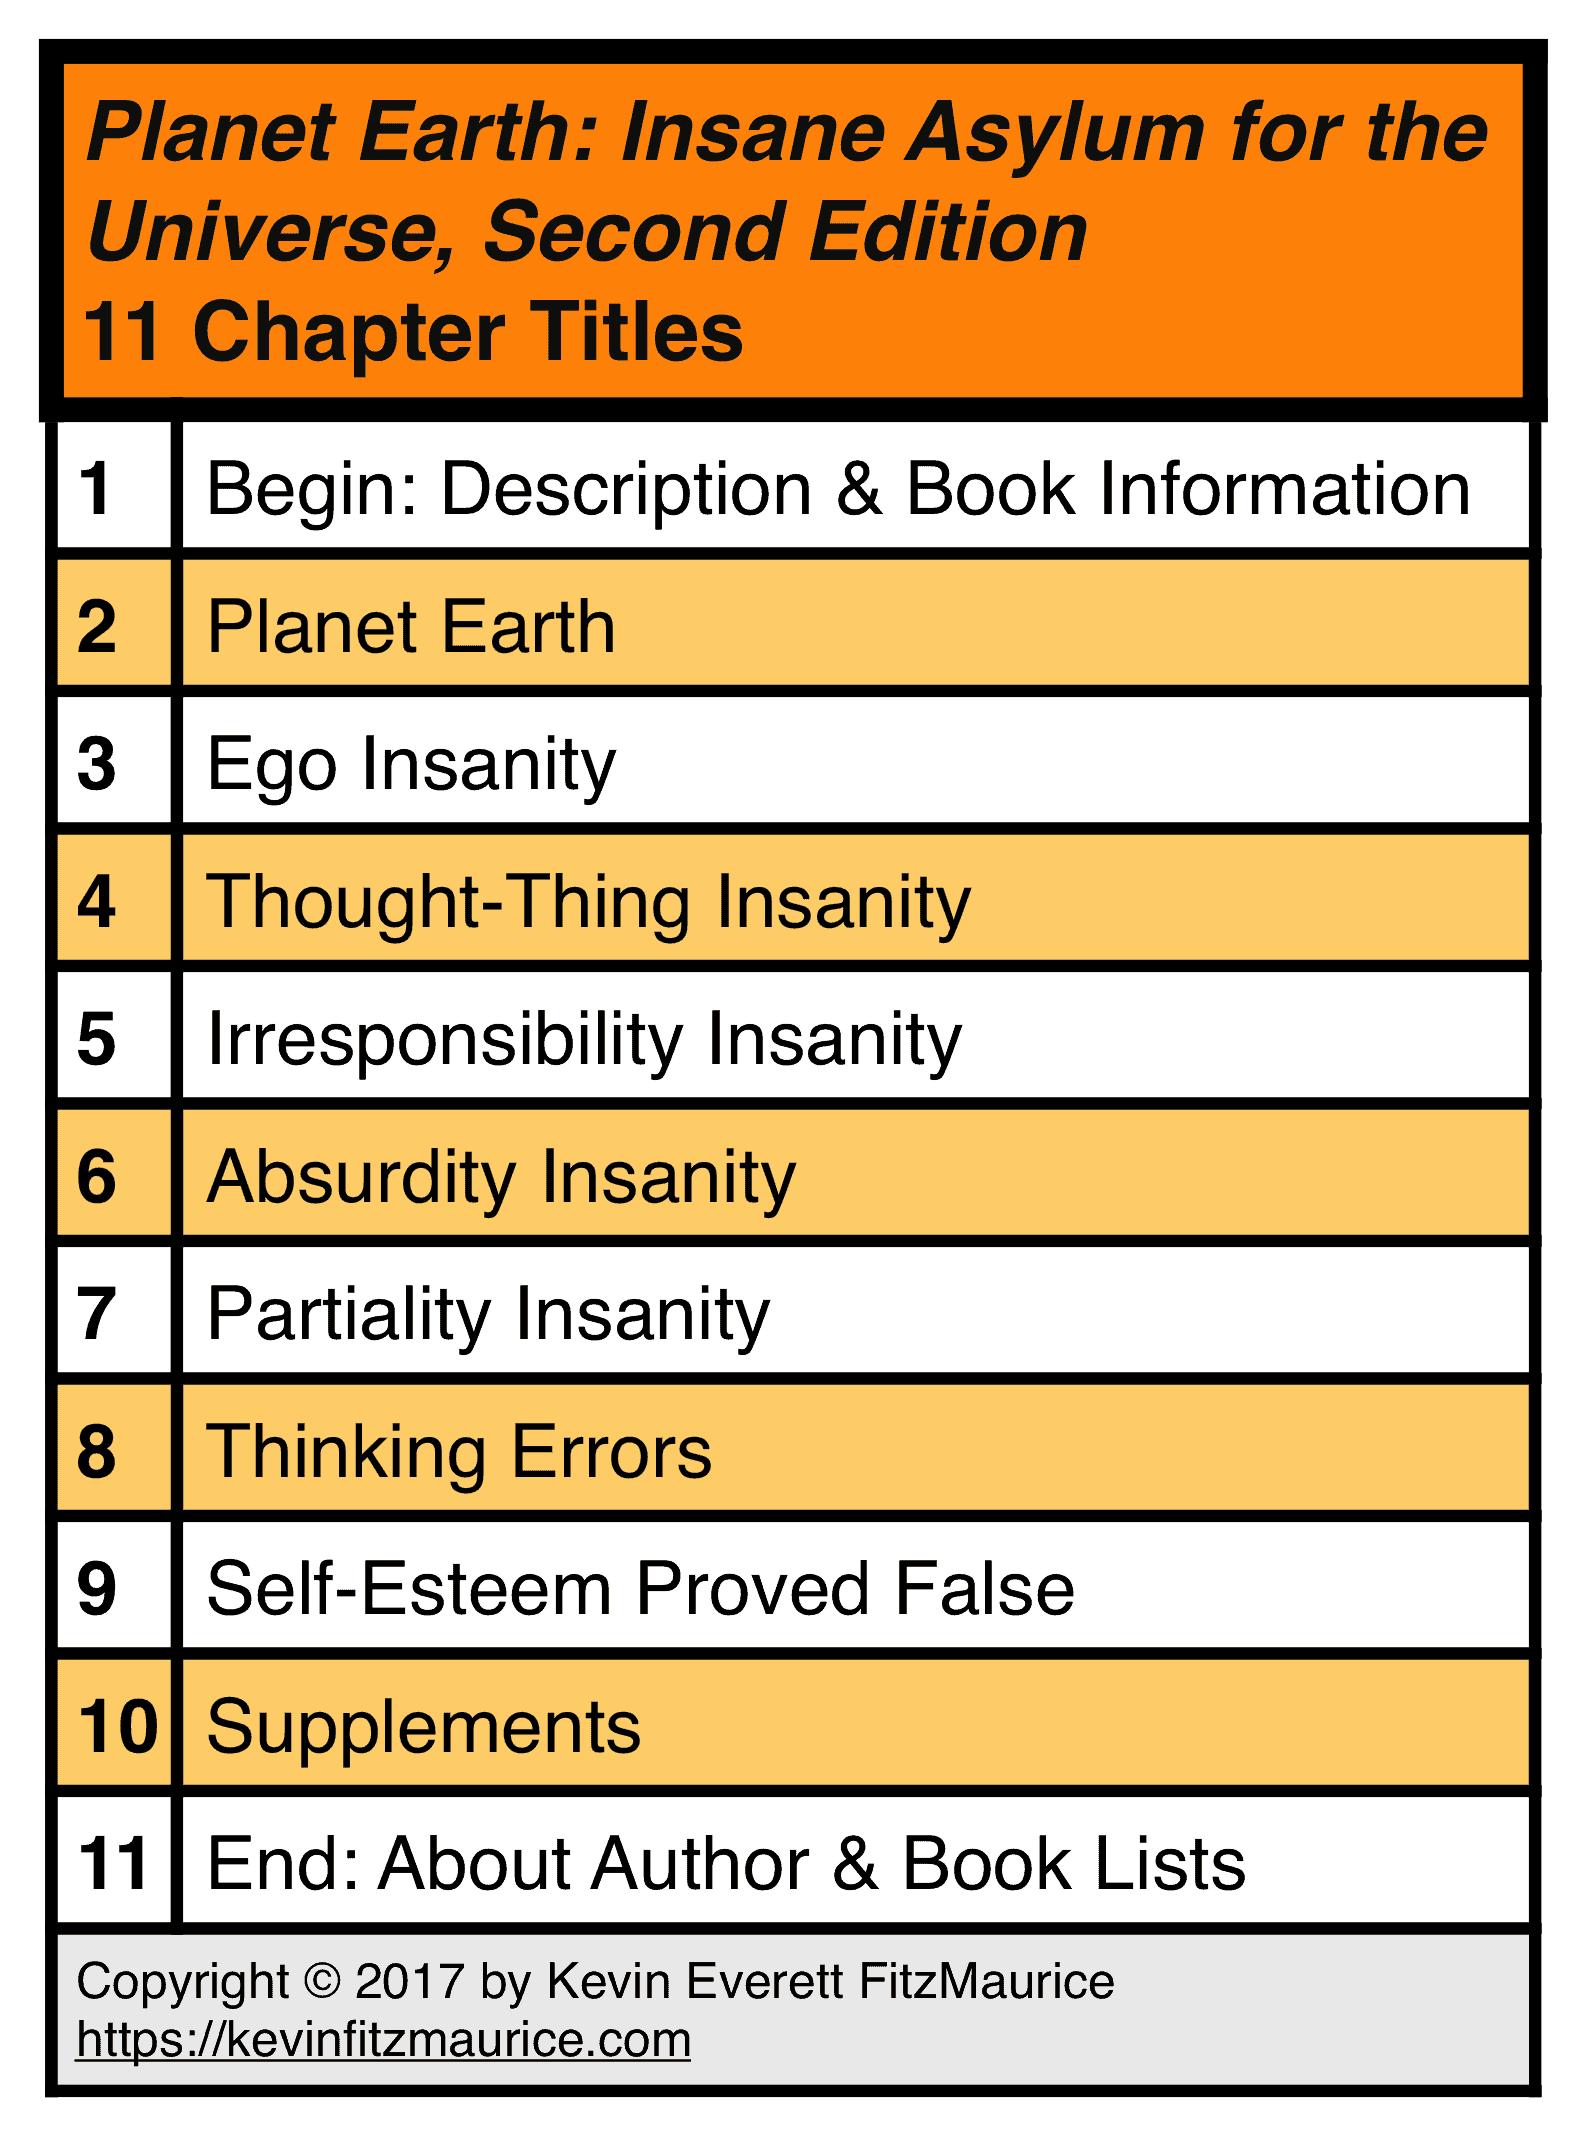 Planet Earth: Insane Asylum - 11 Chapters